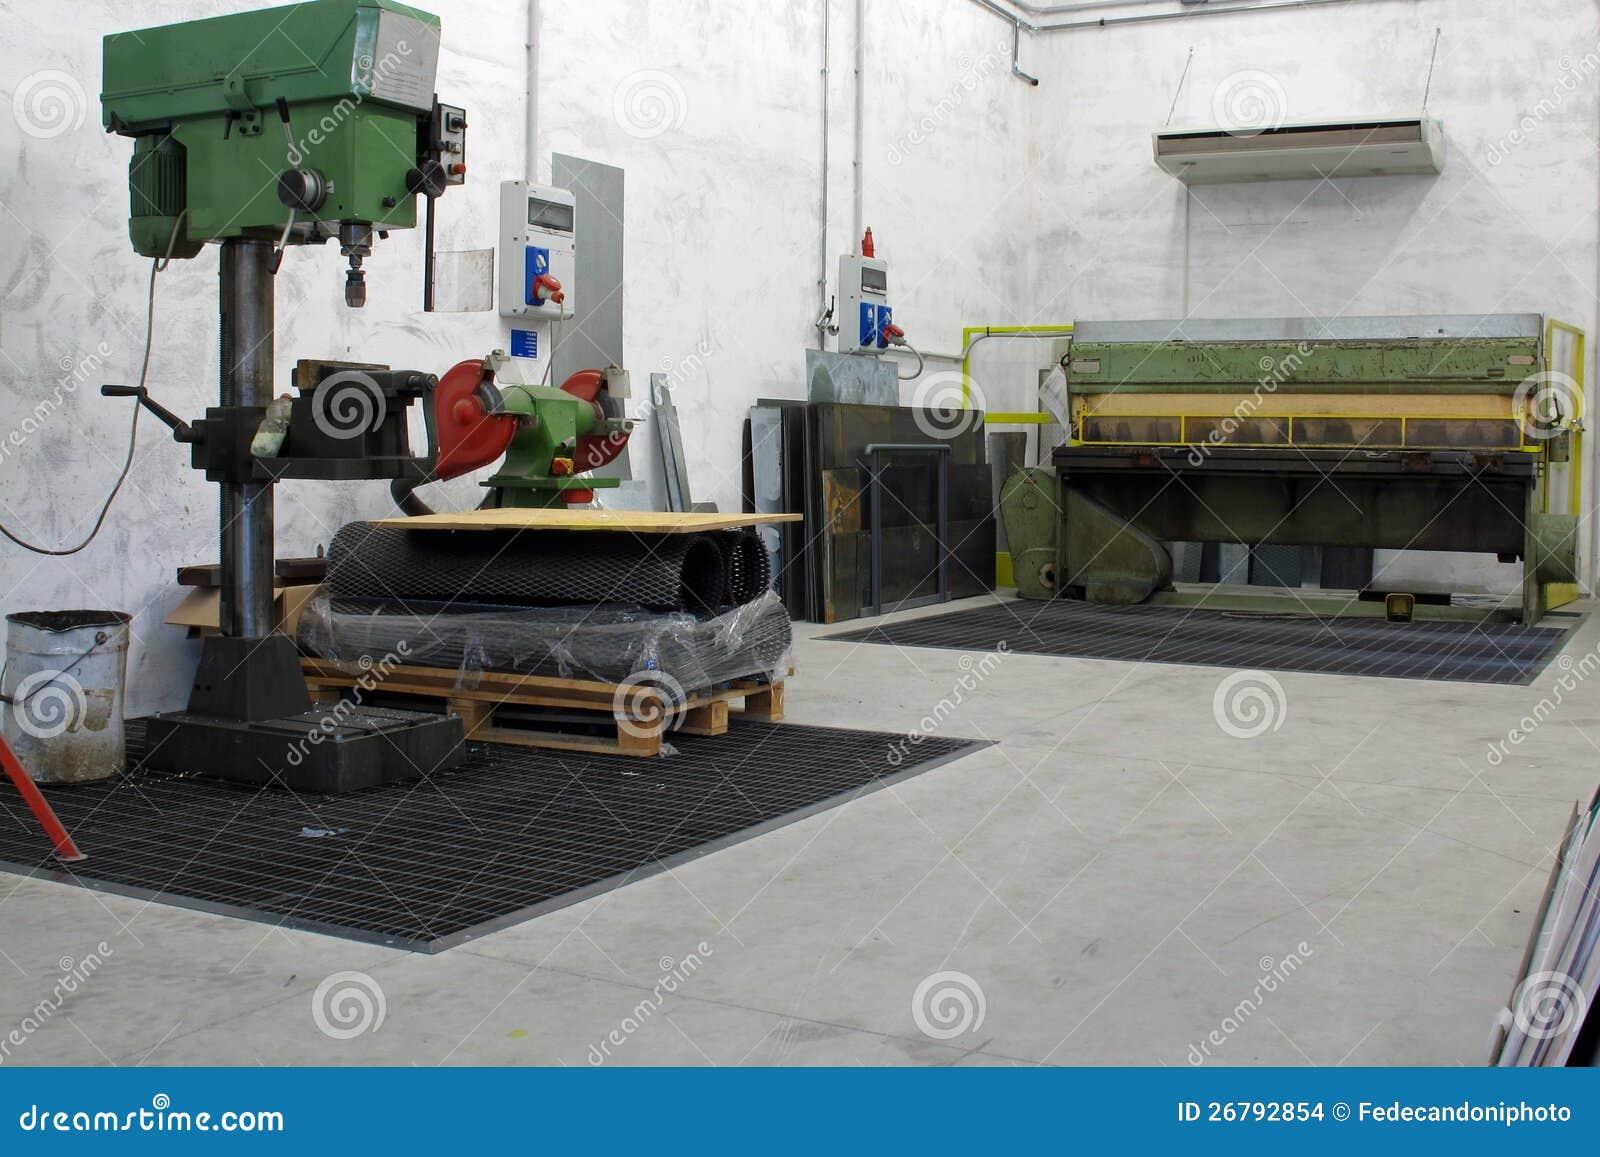 cnc lathe machine shop